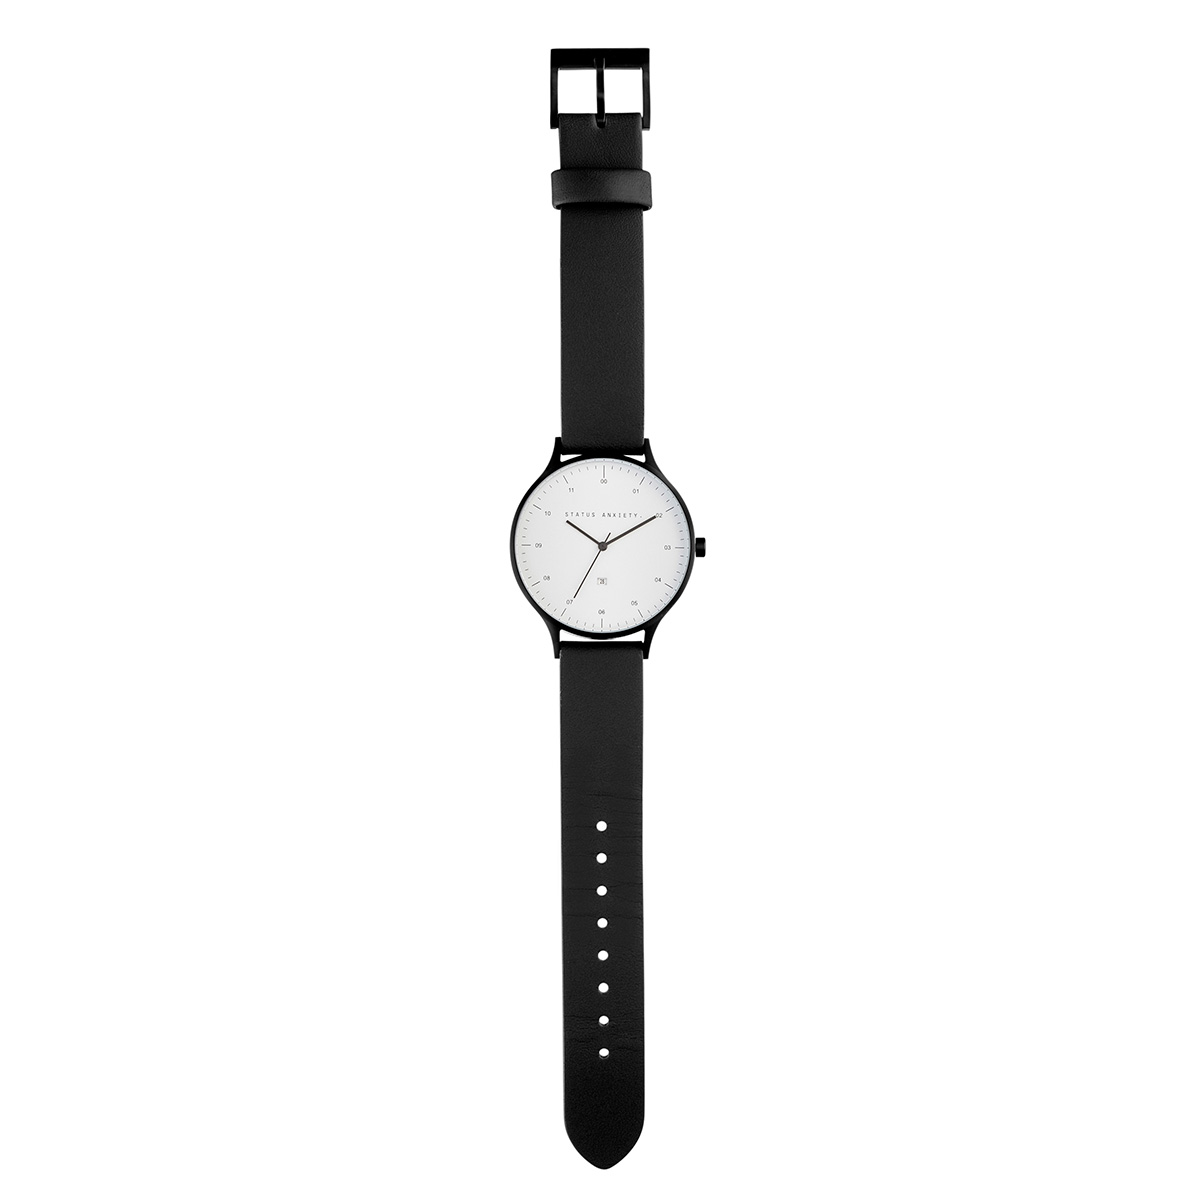 12de53857 Status Anxiety Inertia Watch- Matte Black/White Face/ Black Strap ...